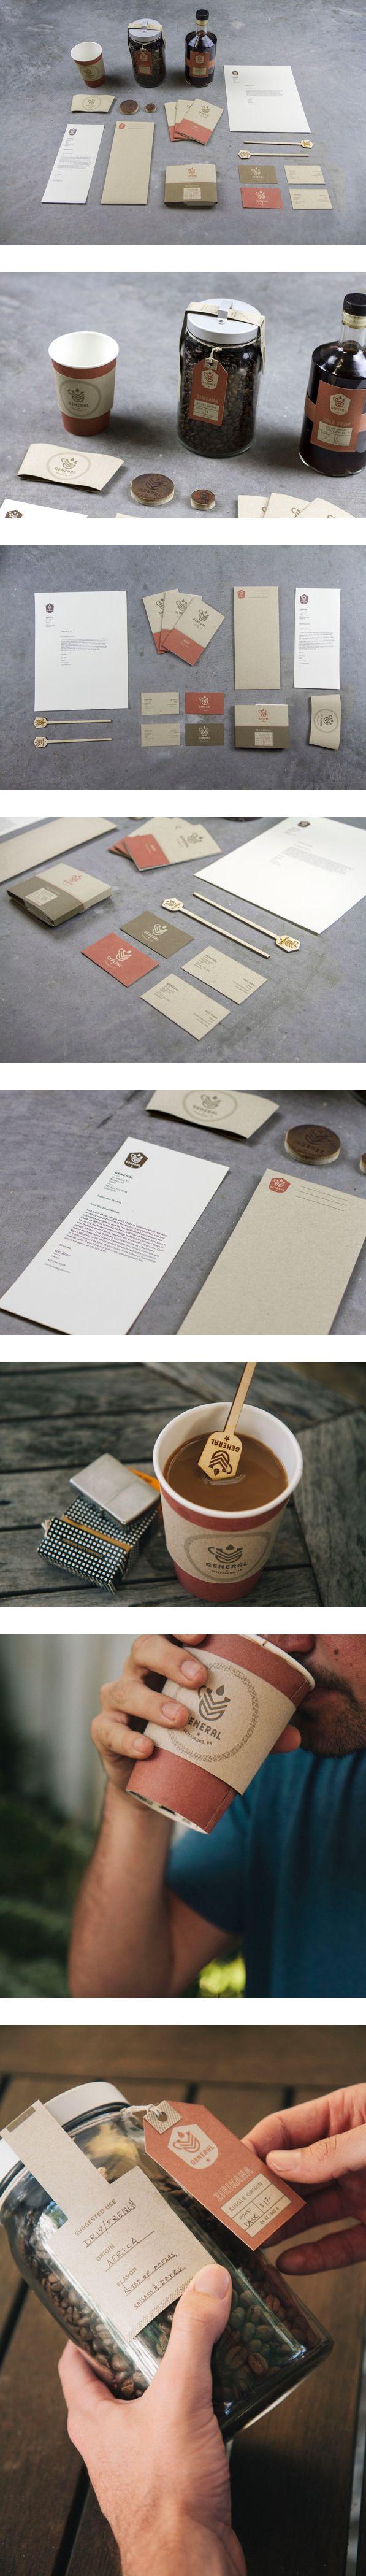 General Cafe by Clarke Harris. #restaurantgraphics #typography